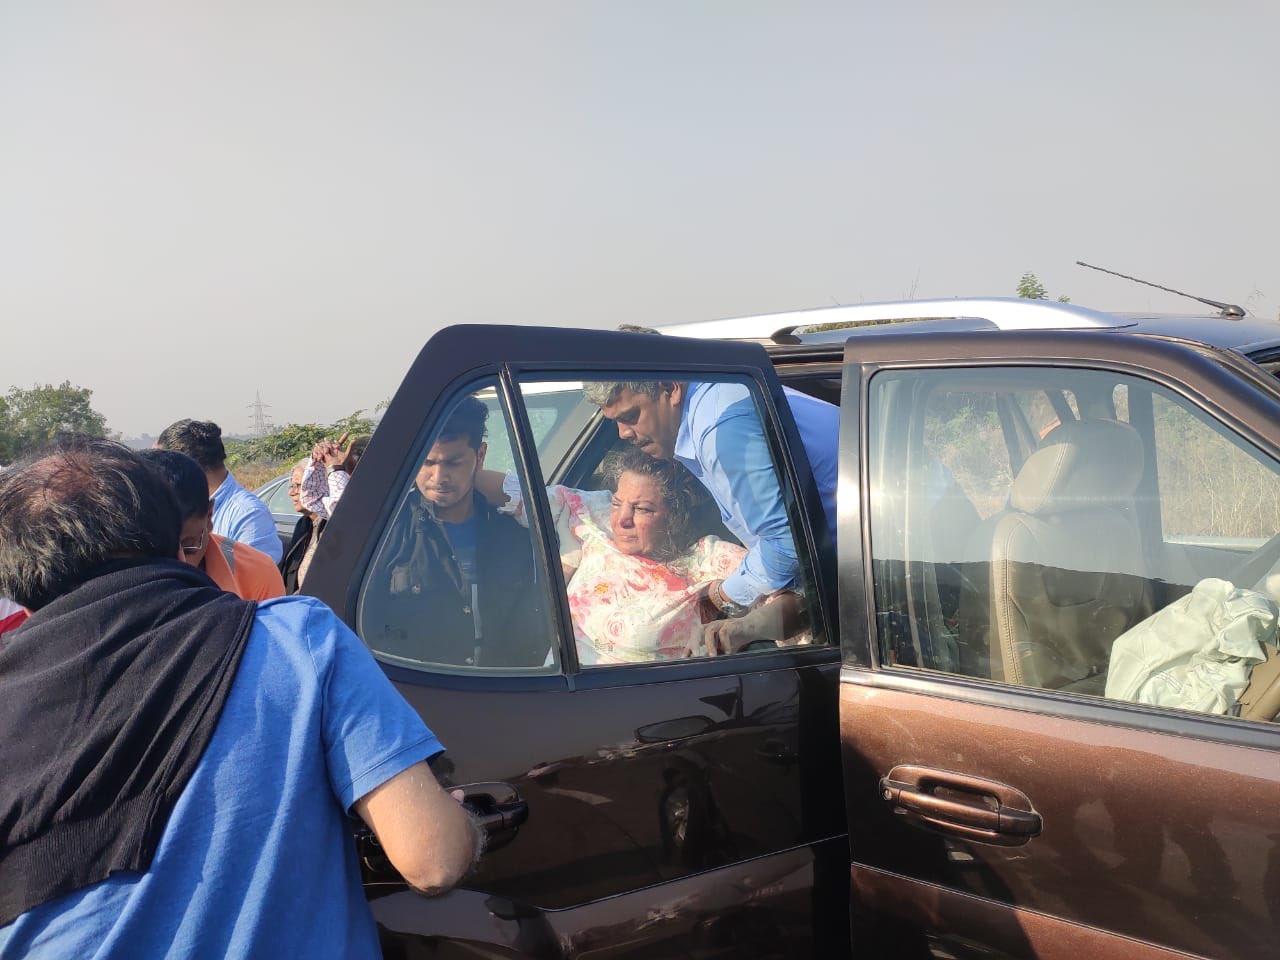 Shabana Azmi injured in car accident